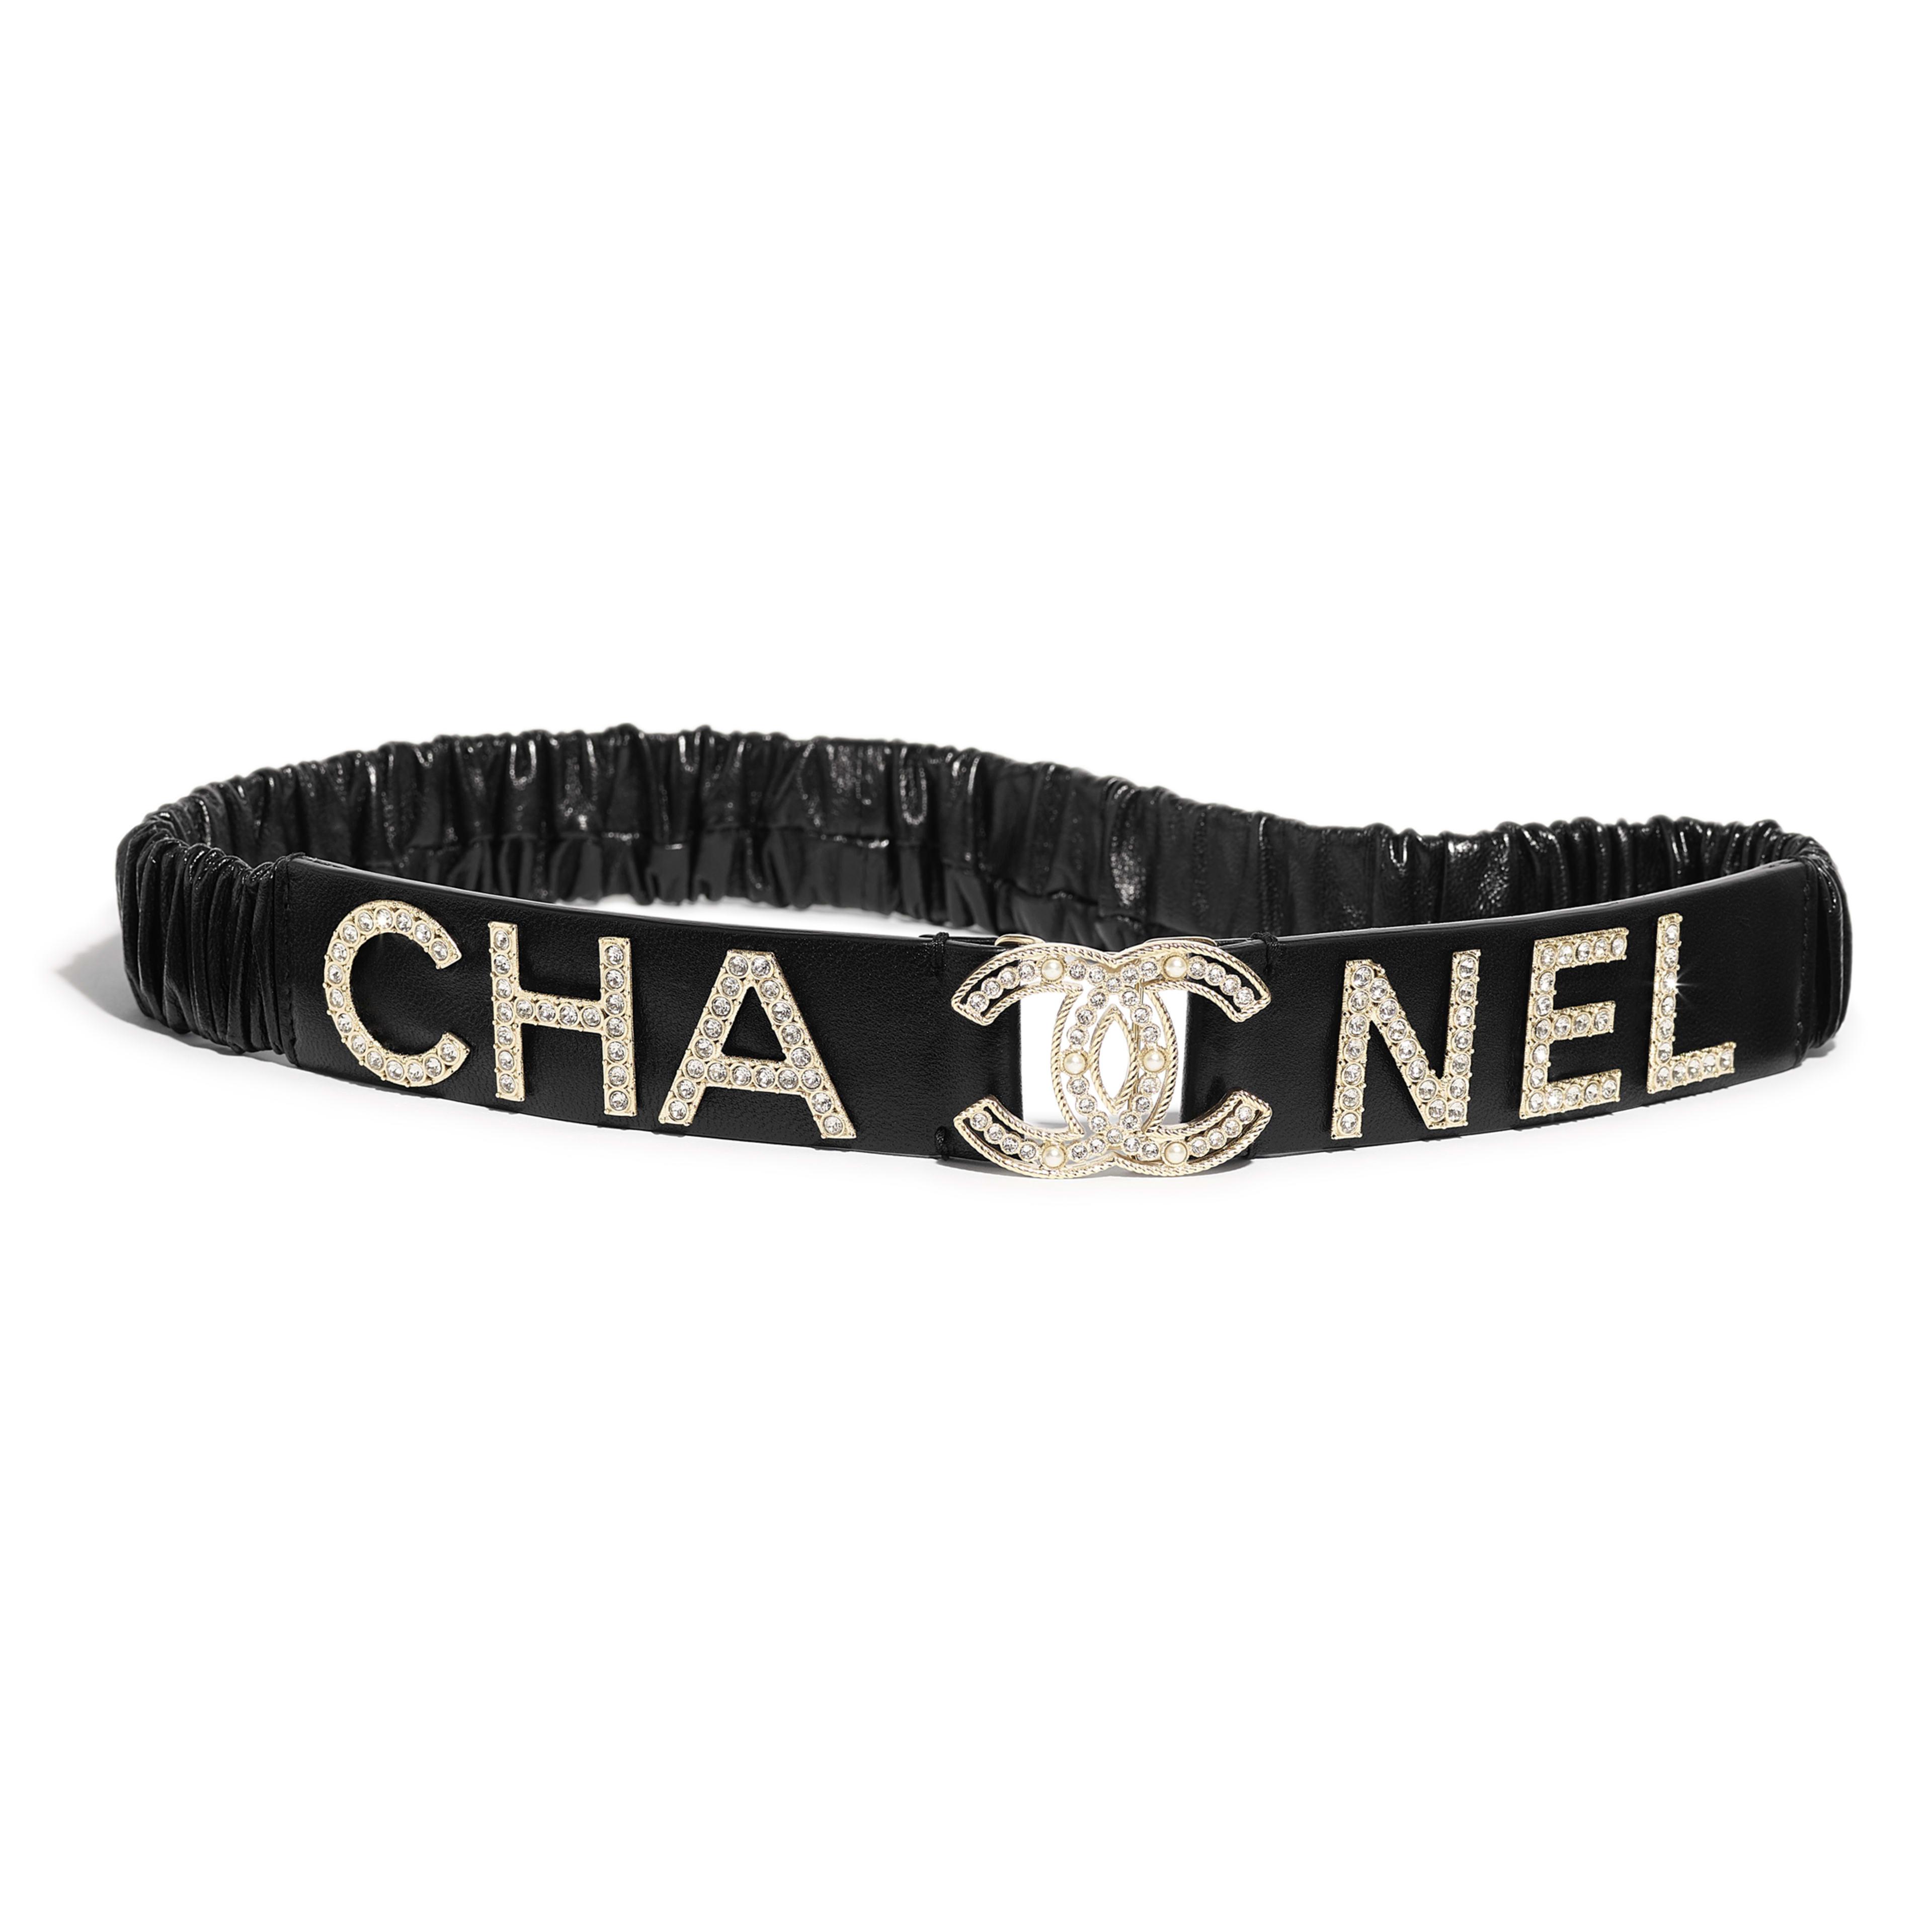 Belt - Black - Lambskin, Gold-Tone Metal, Strass & Glass - Default view - see full sized version